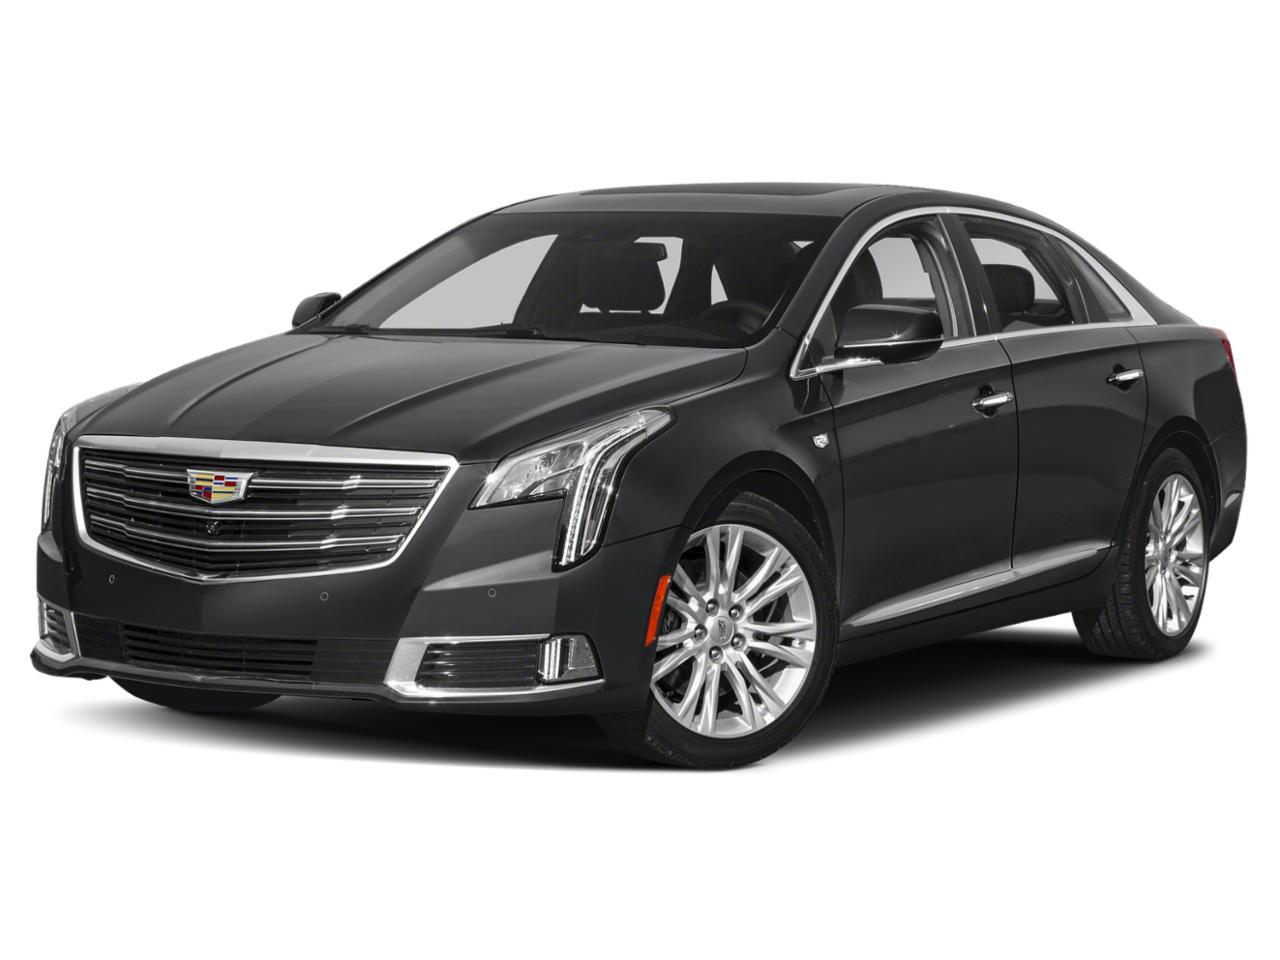 2019 Cadillac XTS Vehicle Photo in Anaheim, CA 92806